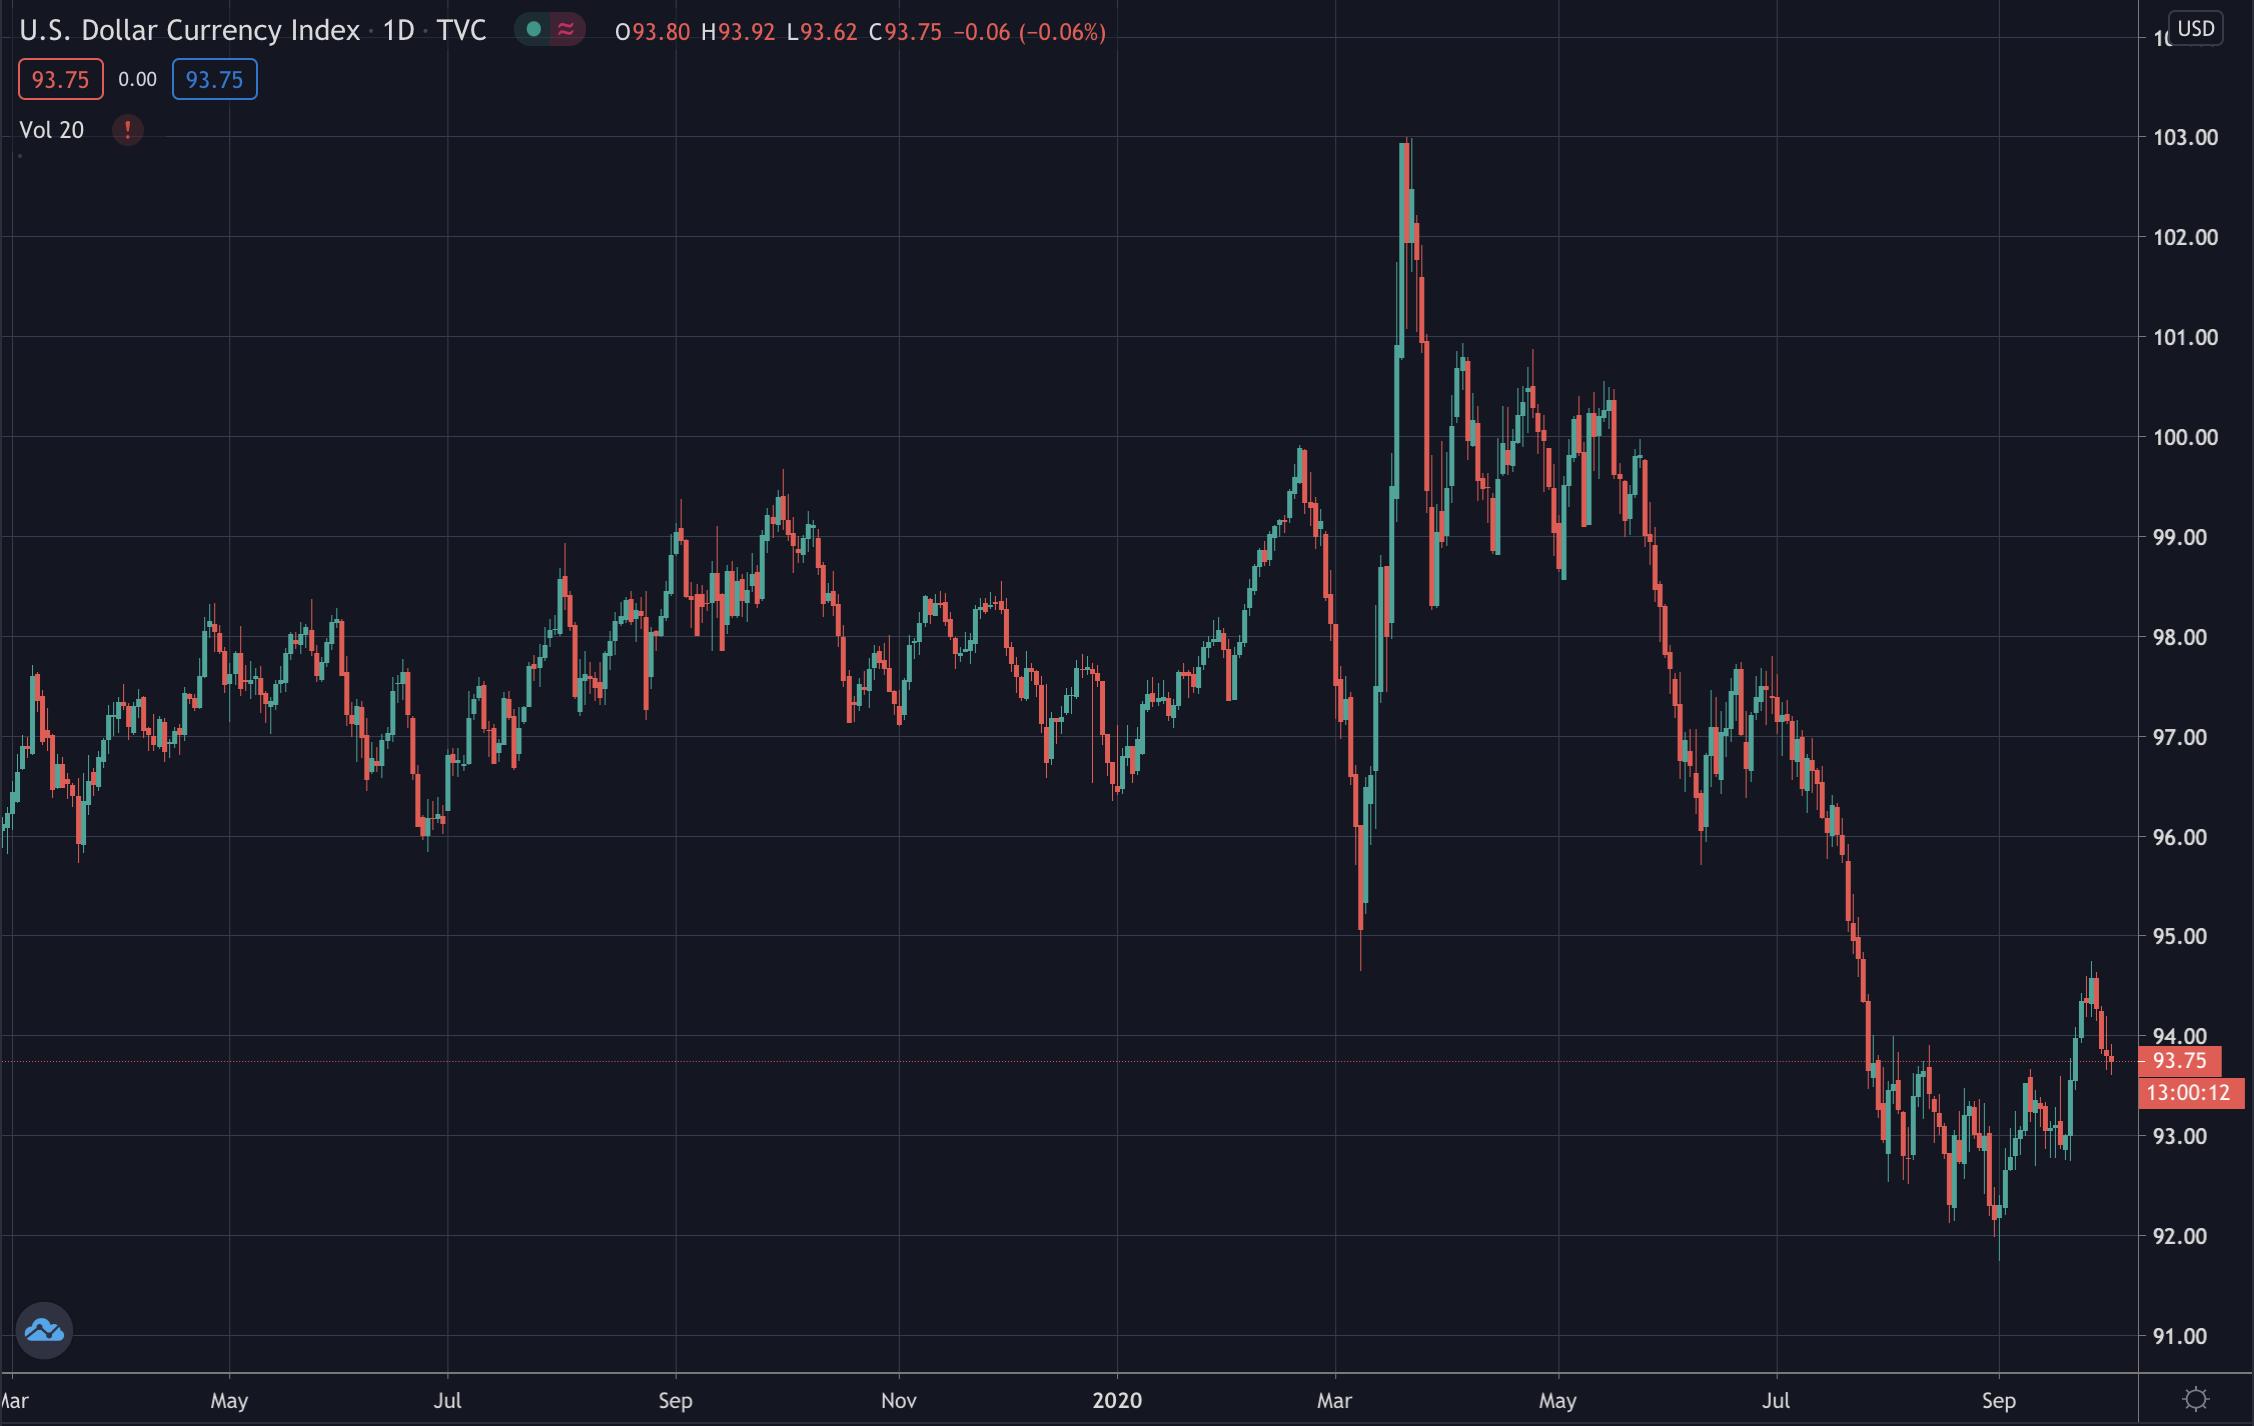 Dollar strength index, Oct 2020